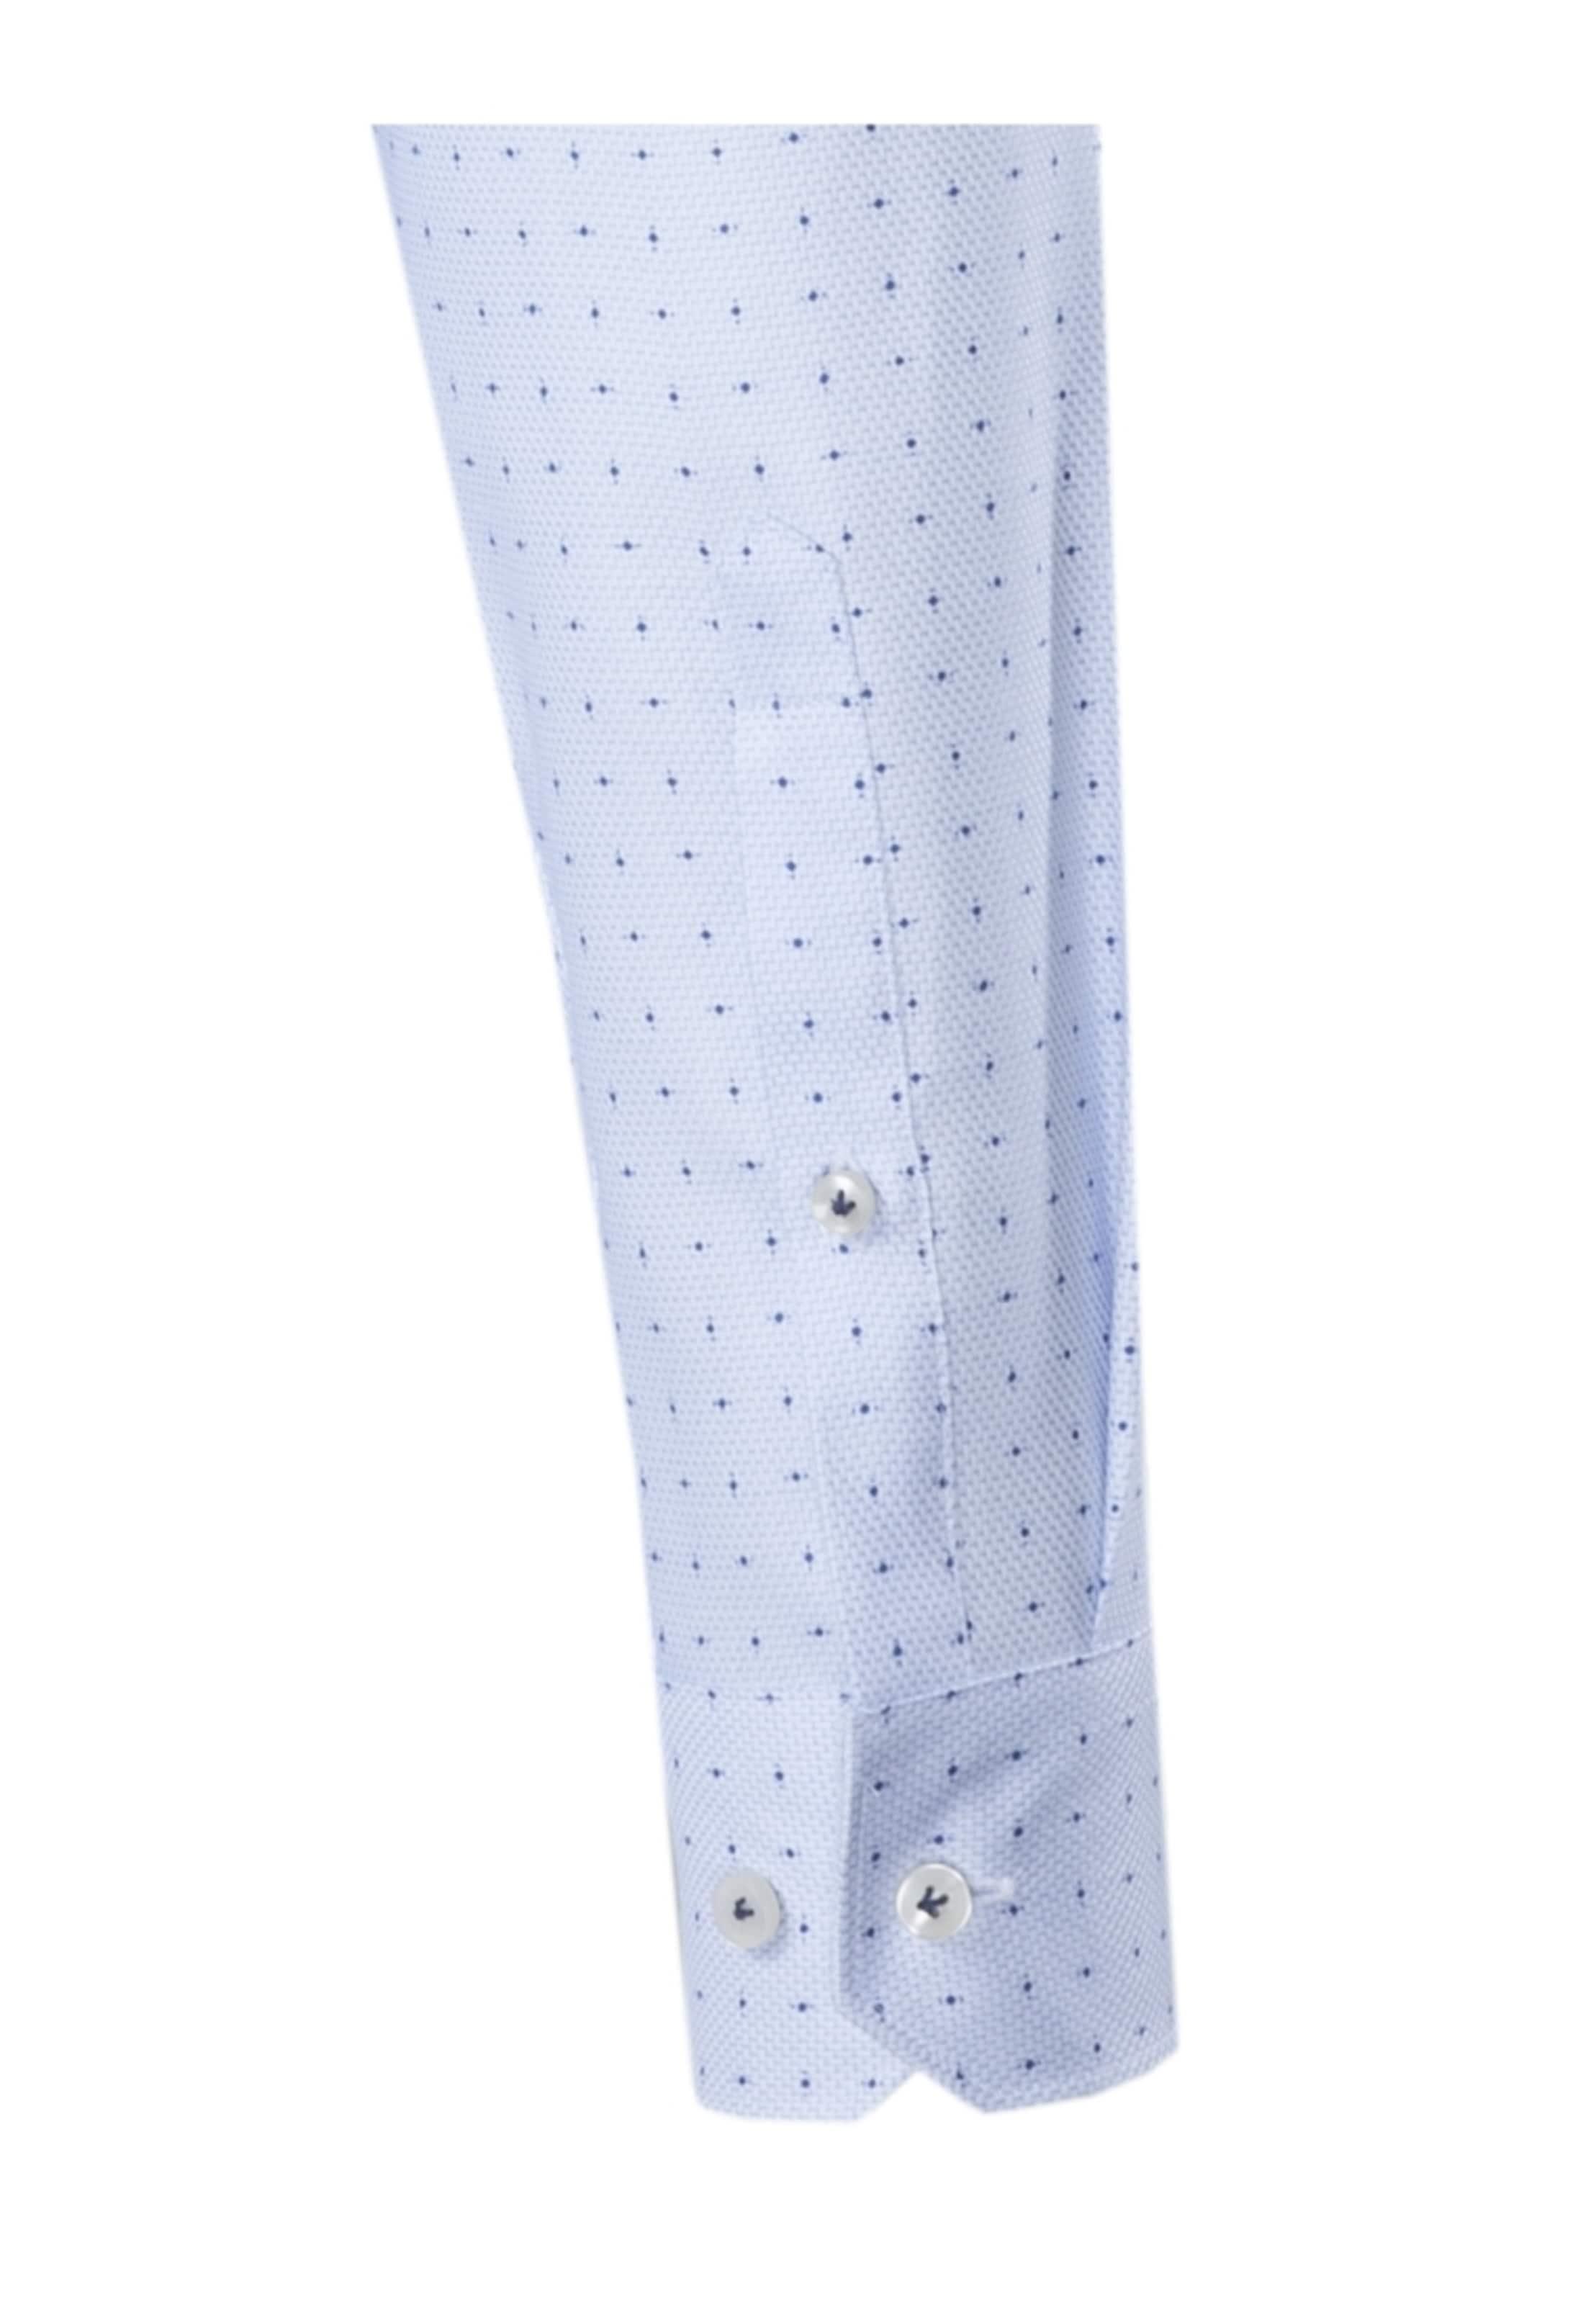 Jacques Britt City-Hemd 'Custom Fit' Günstig Kaufen 2018 Neue Versand Rabatt Verkauf 2018 Neu Zu Verkaufen H3Iid1kv